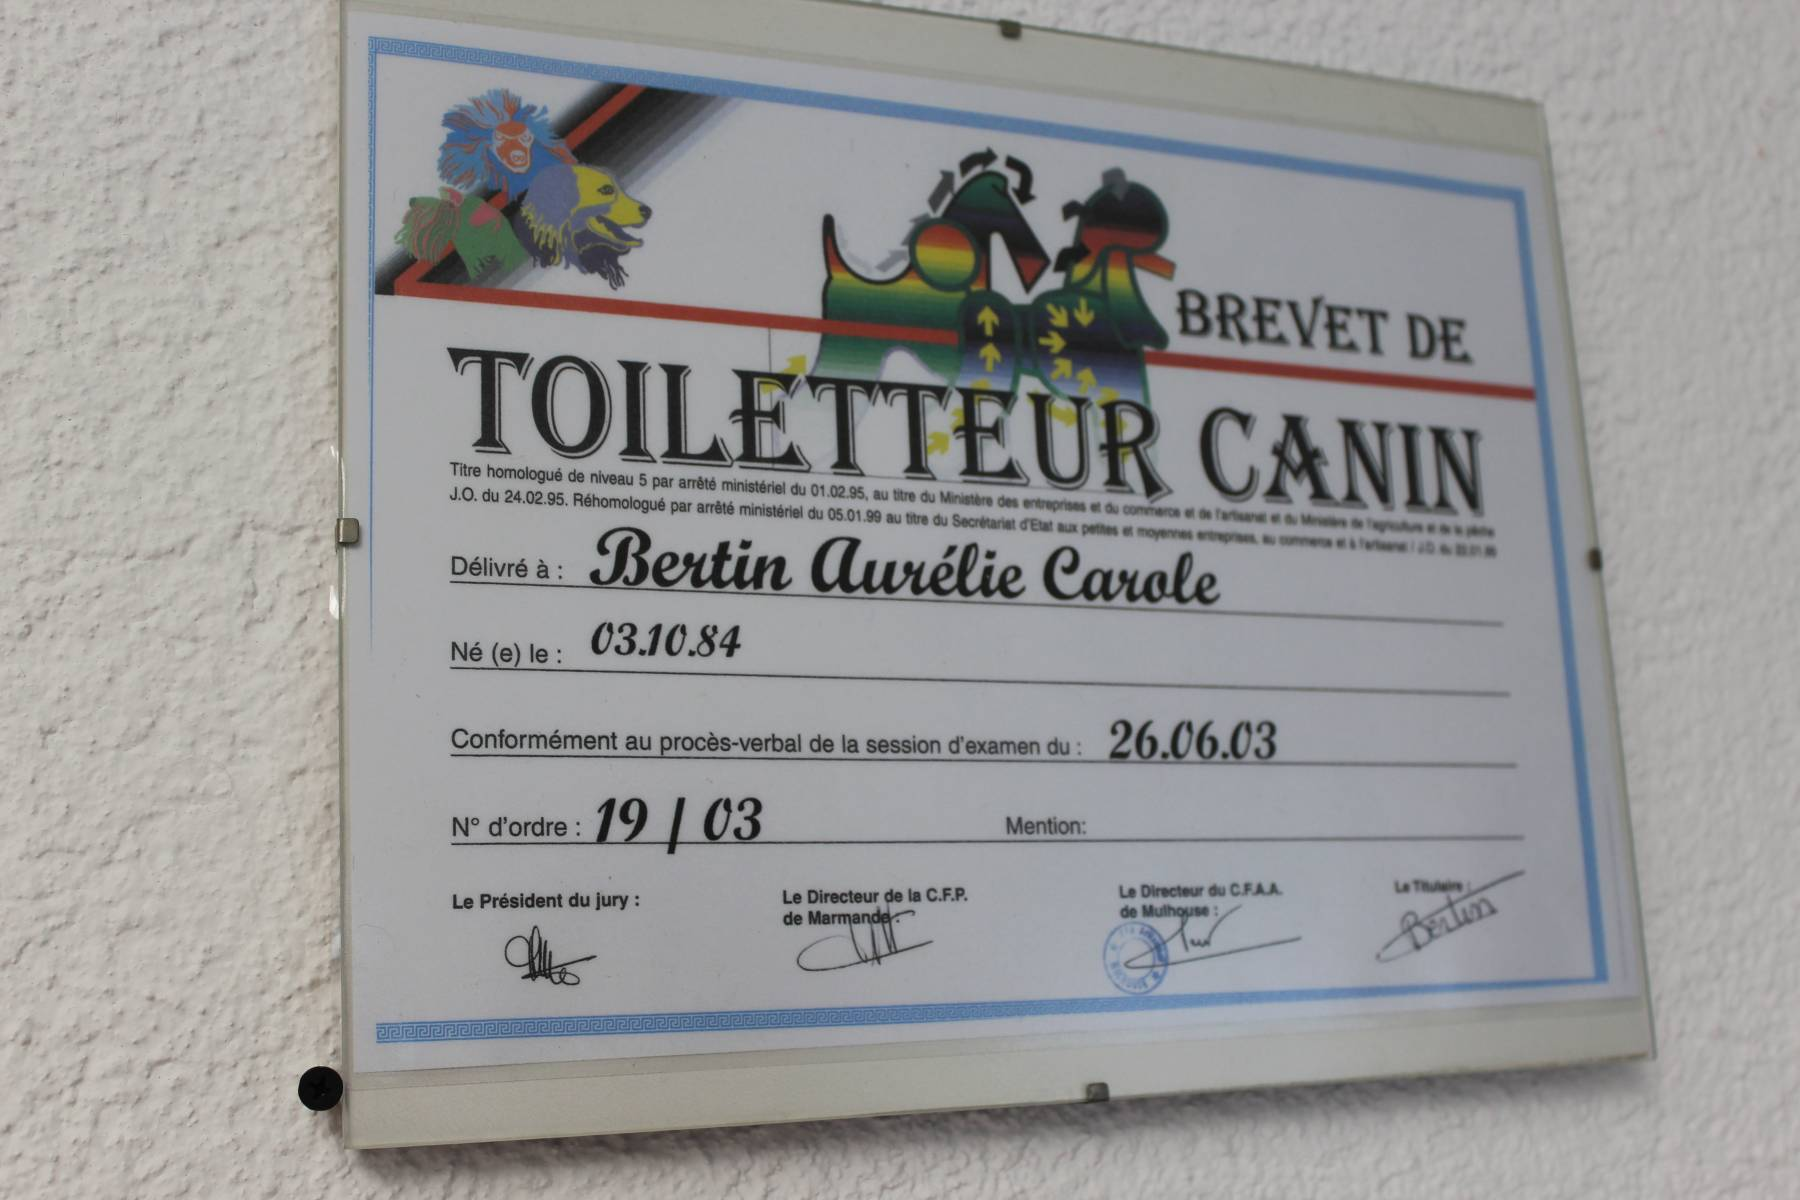 Toiletteur canin